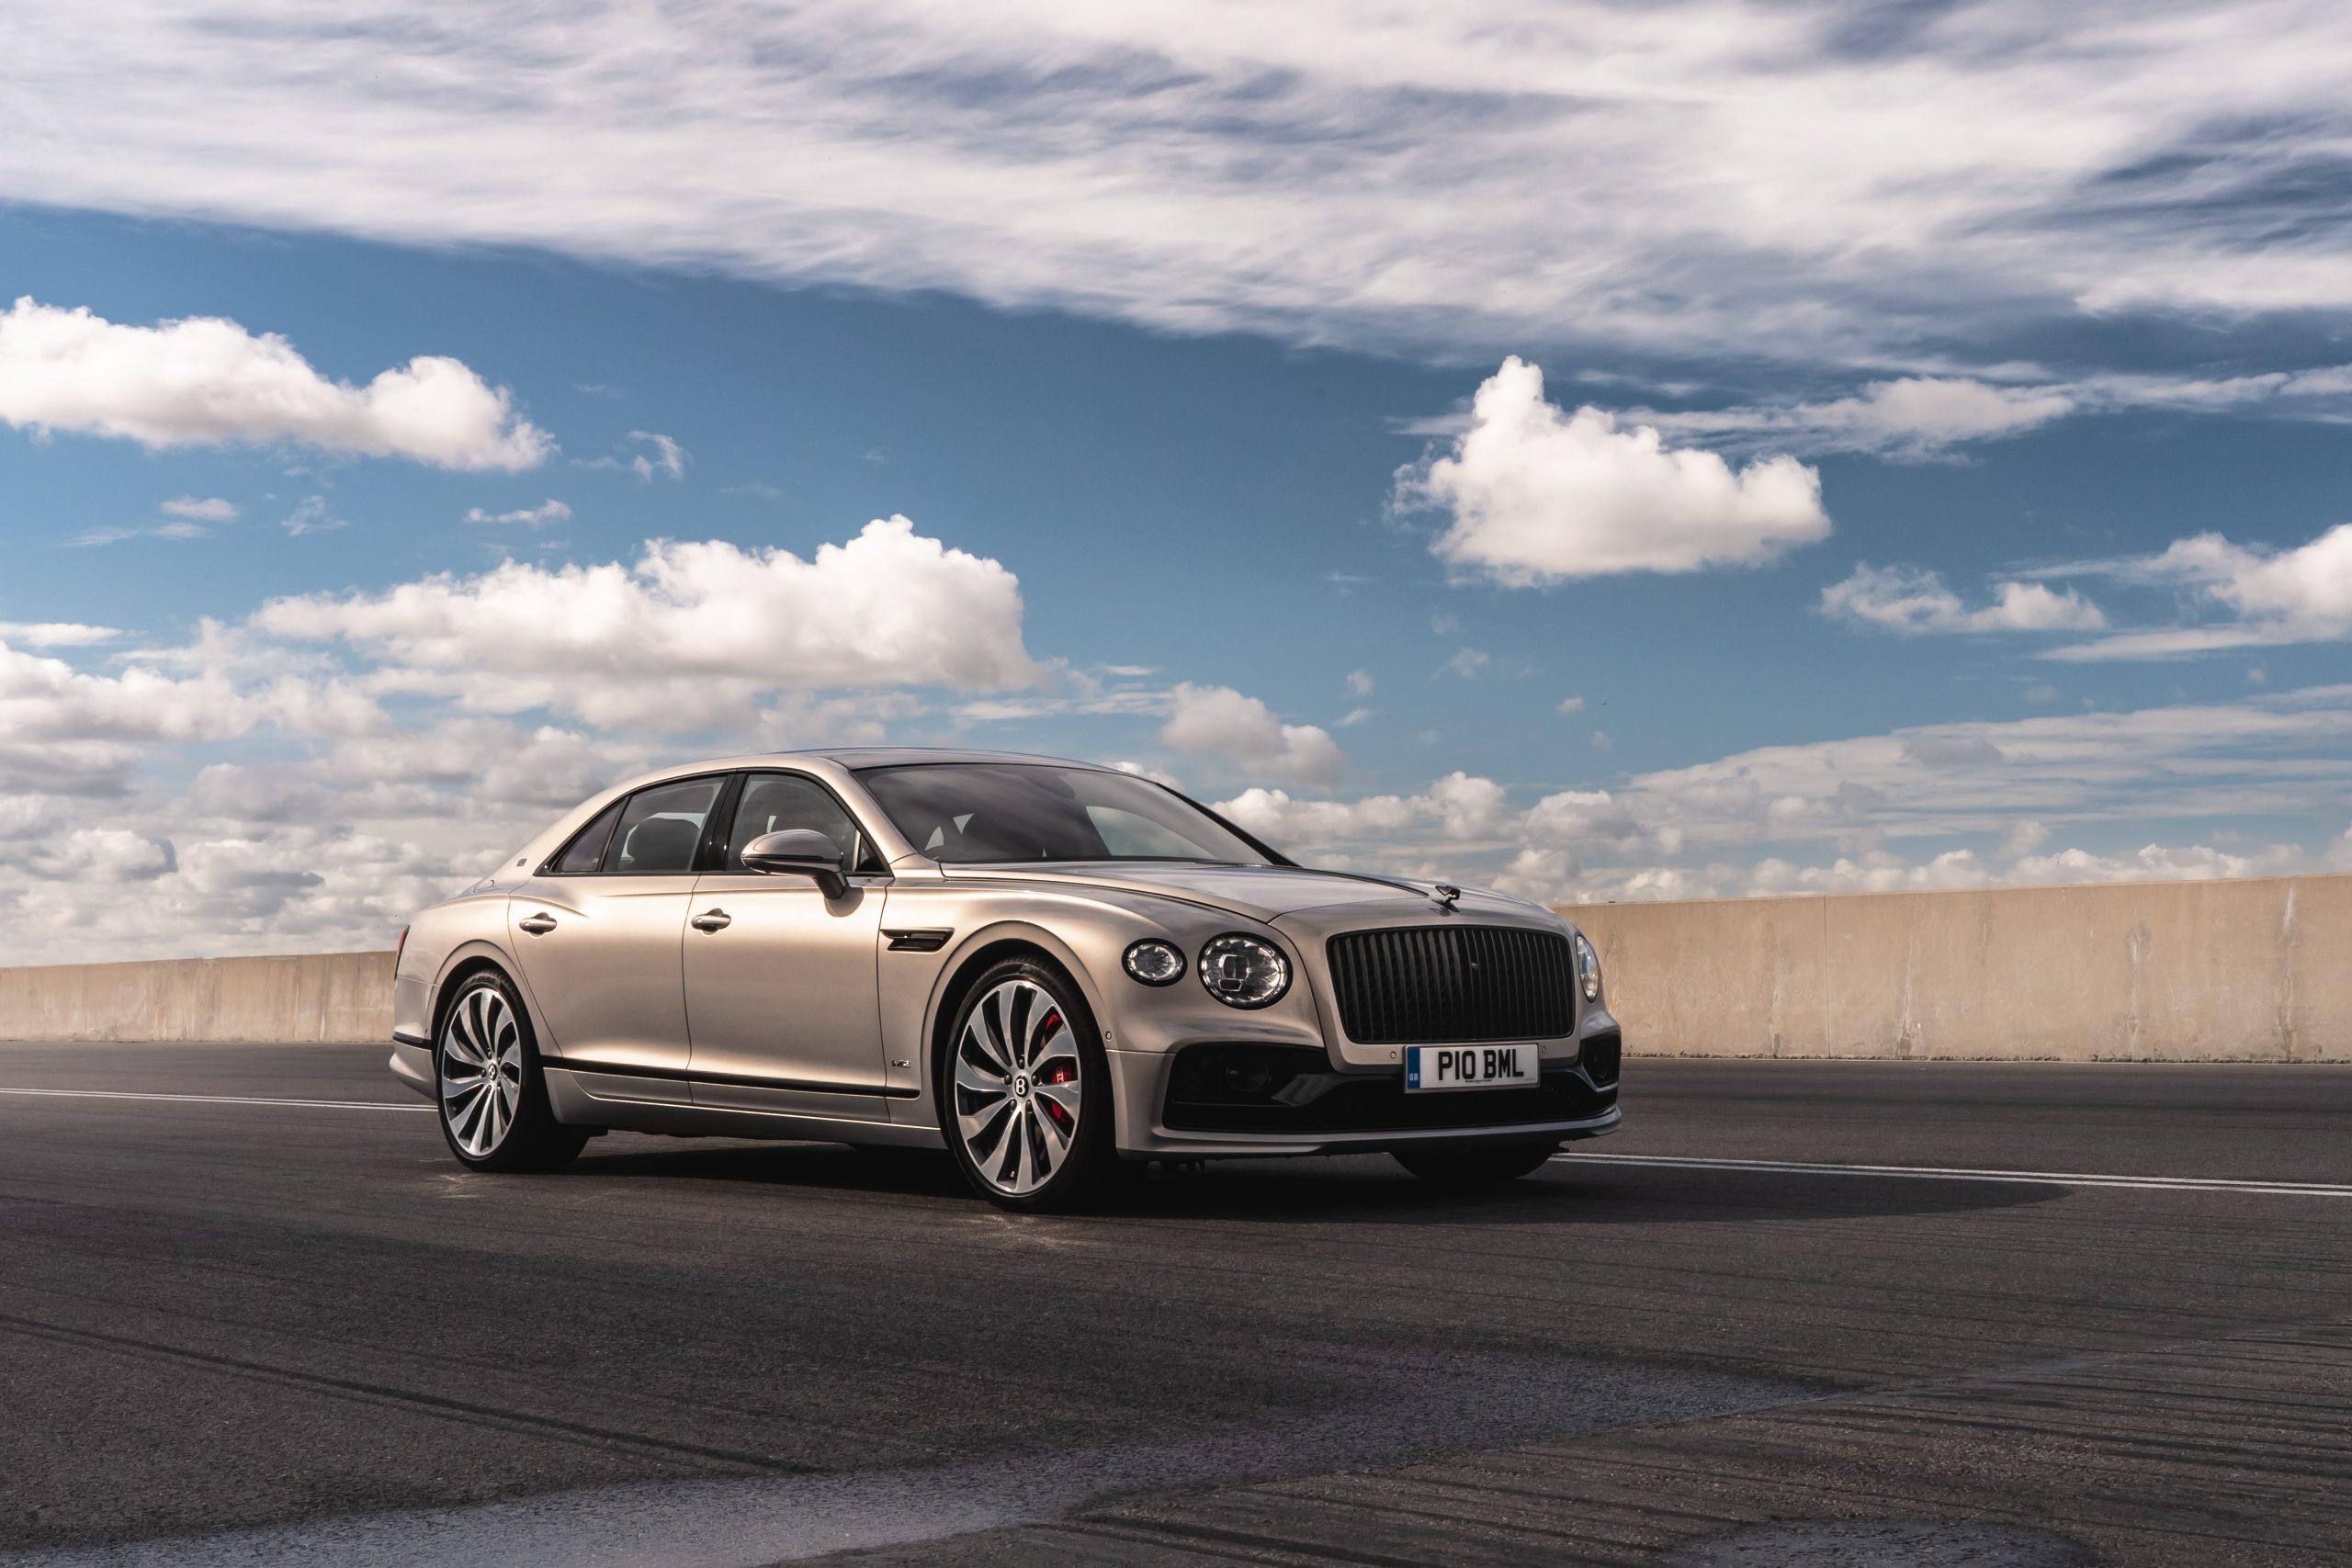 Fastest Four-Door Cars - 2021 Bentley Flying Spur